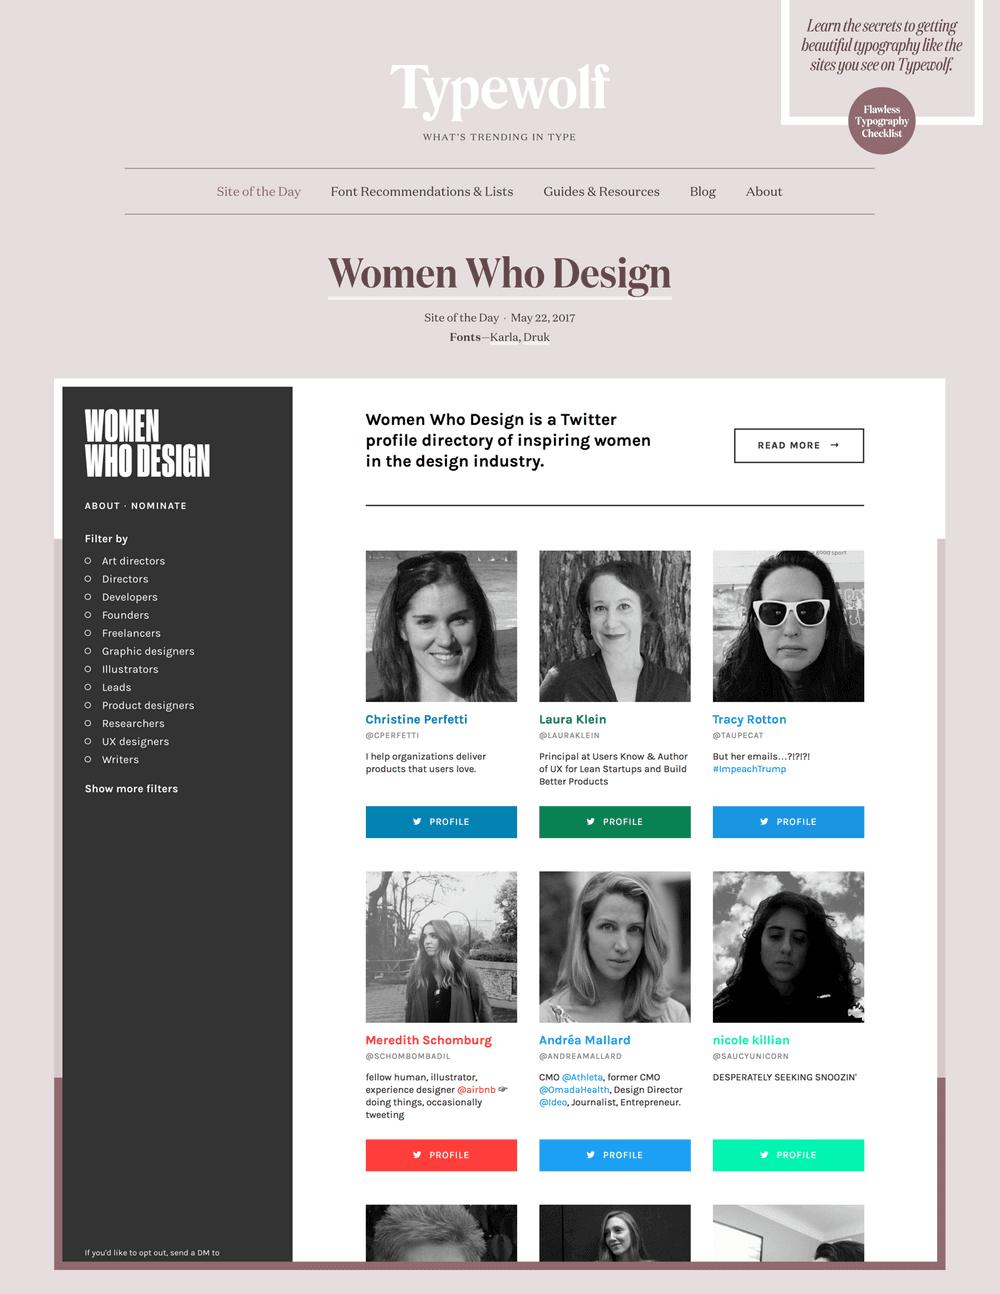 Women Who Design on Typewolf